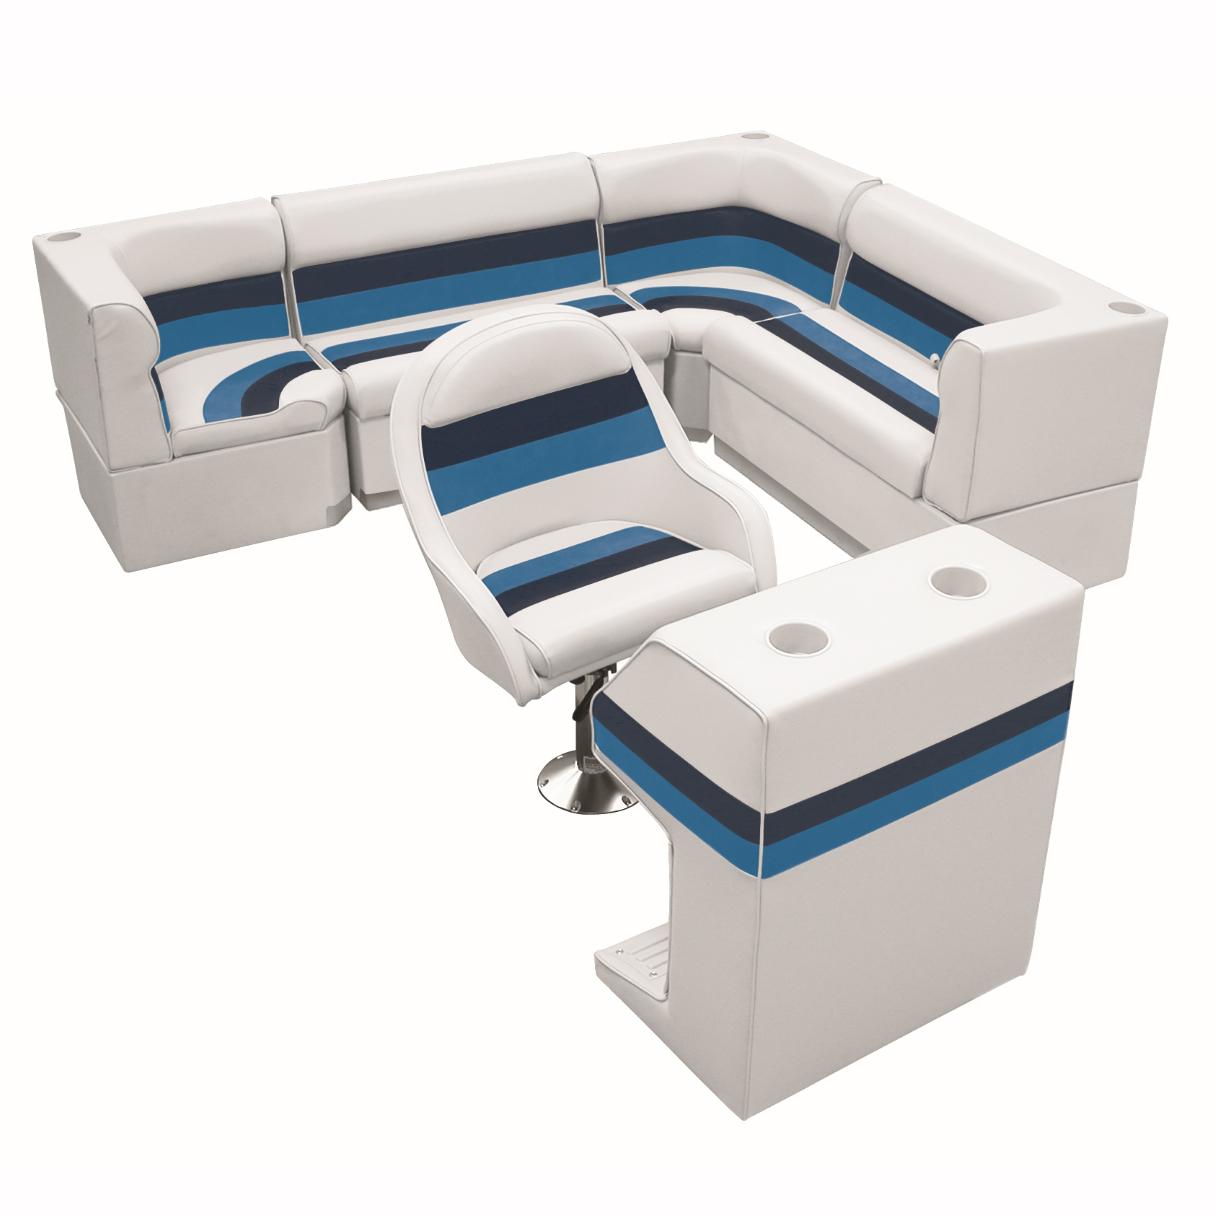 "Deluxe Pontoon Furniture w/Toe Kick Base - Rear Big ""L"" Package, White/Navy/Blue"